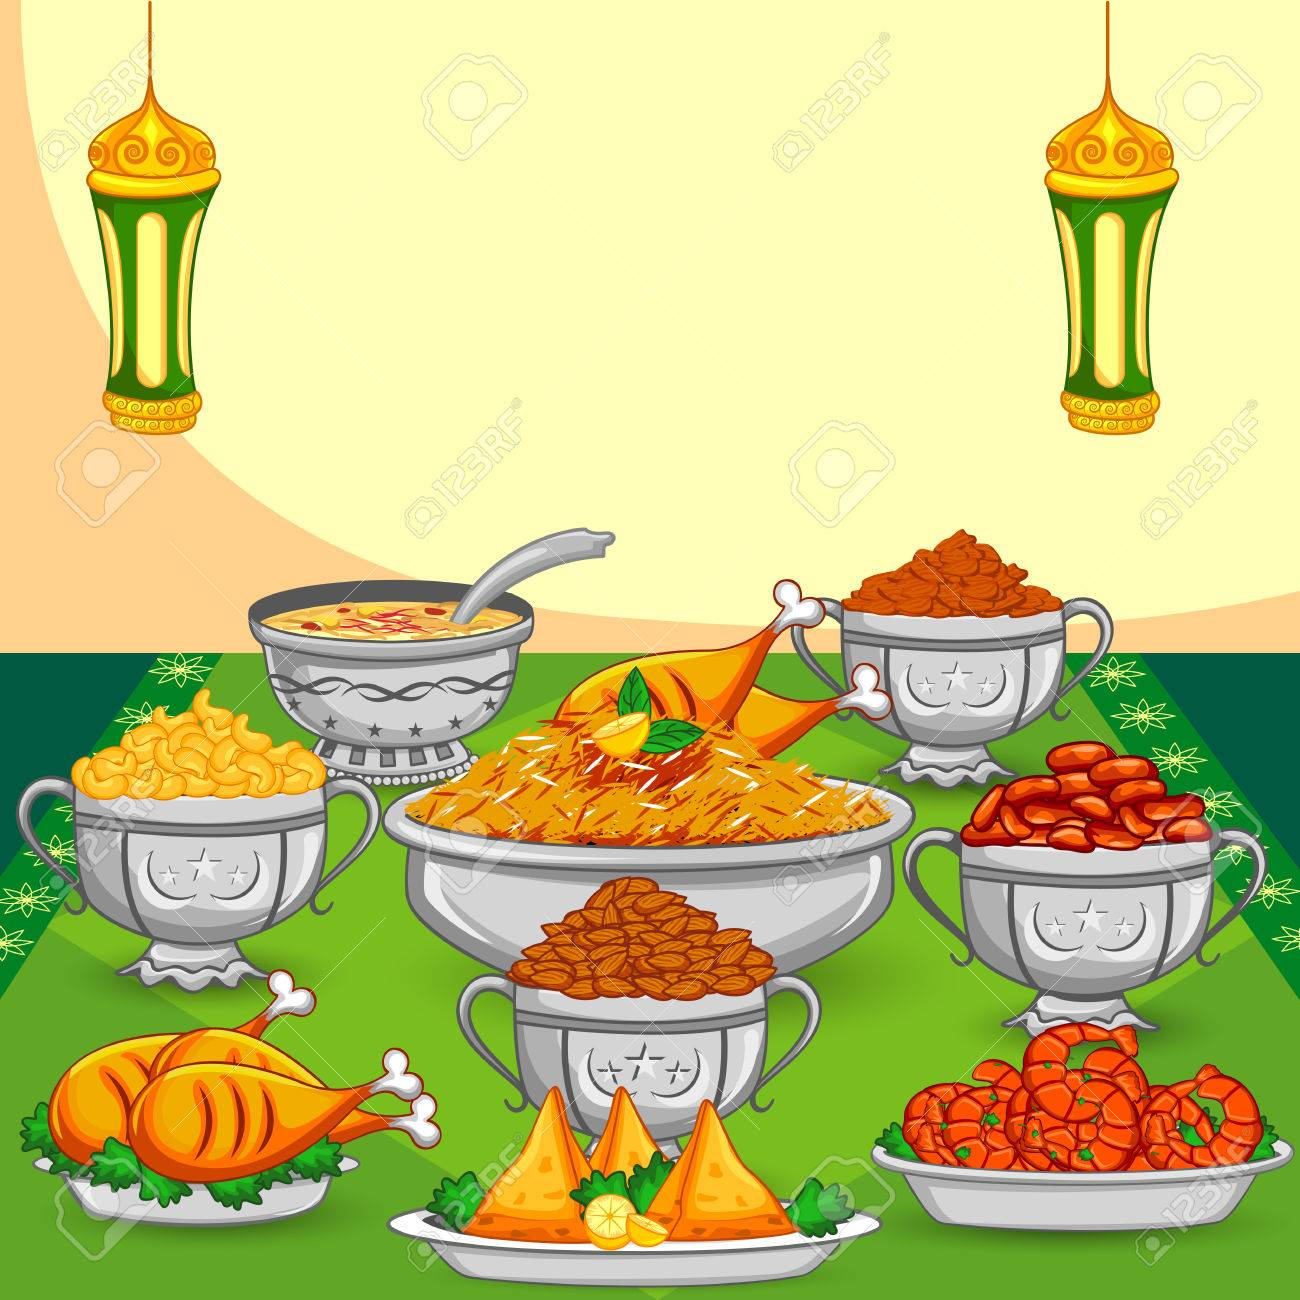 Ramadan Iftar Food For Eid Celebration In Vector Royalty Free ... for Ramadan Iftar Clipart  181obs